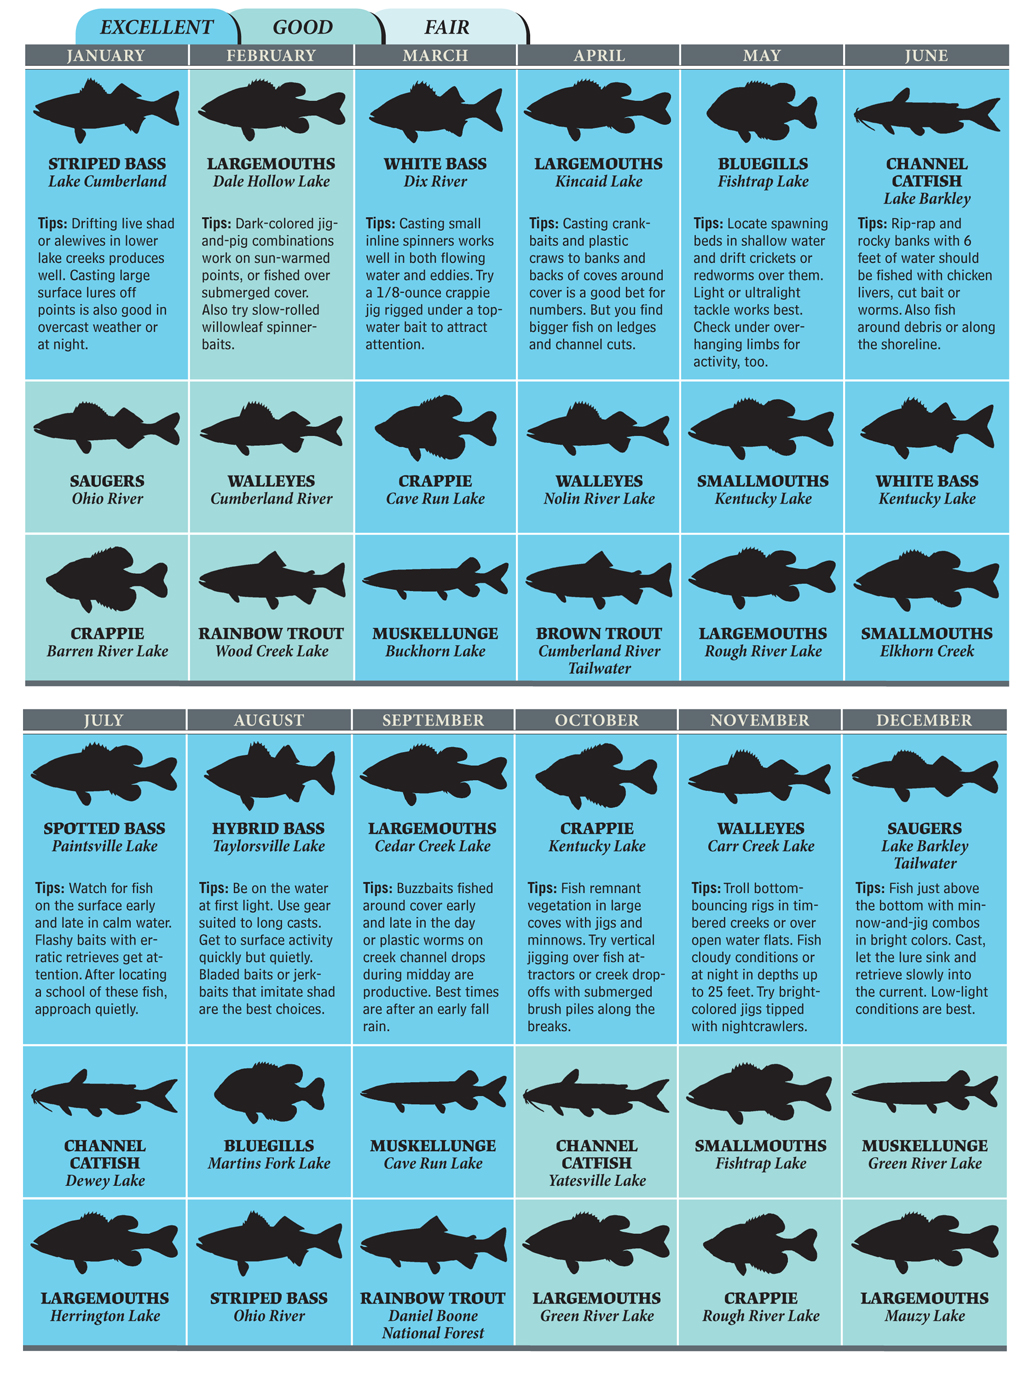 Hot Spots for Kentucky Fishing in 2012